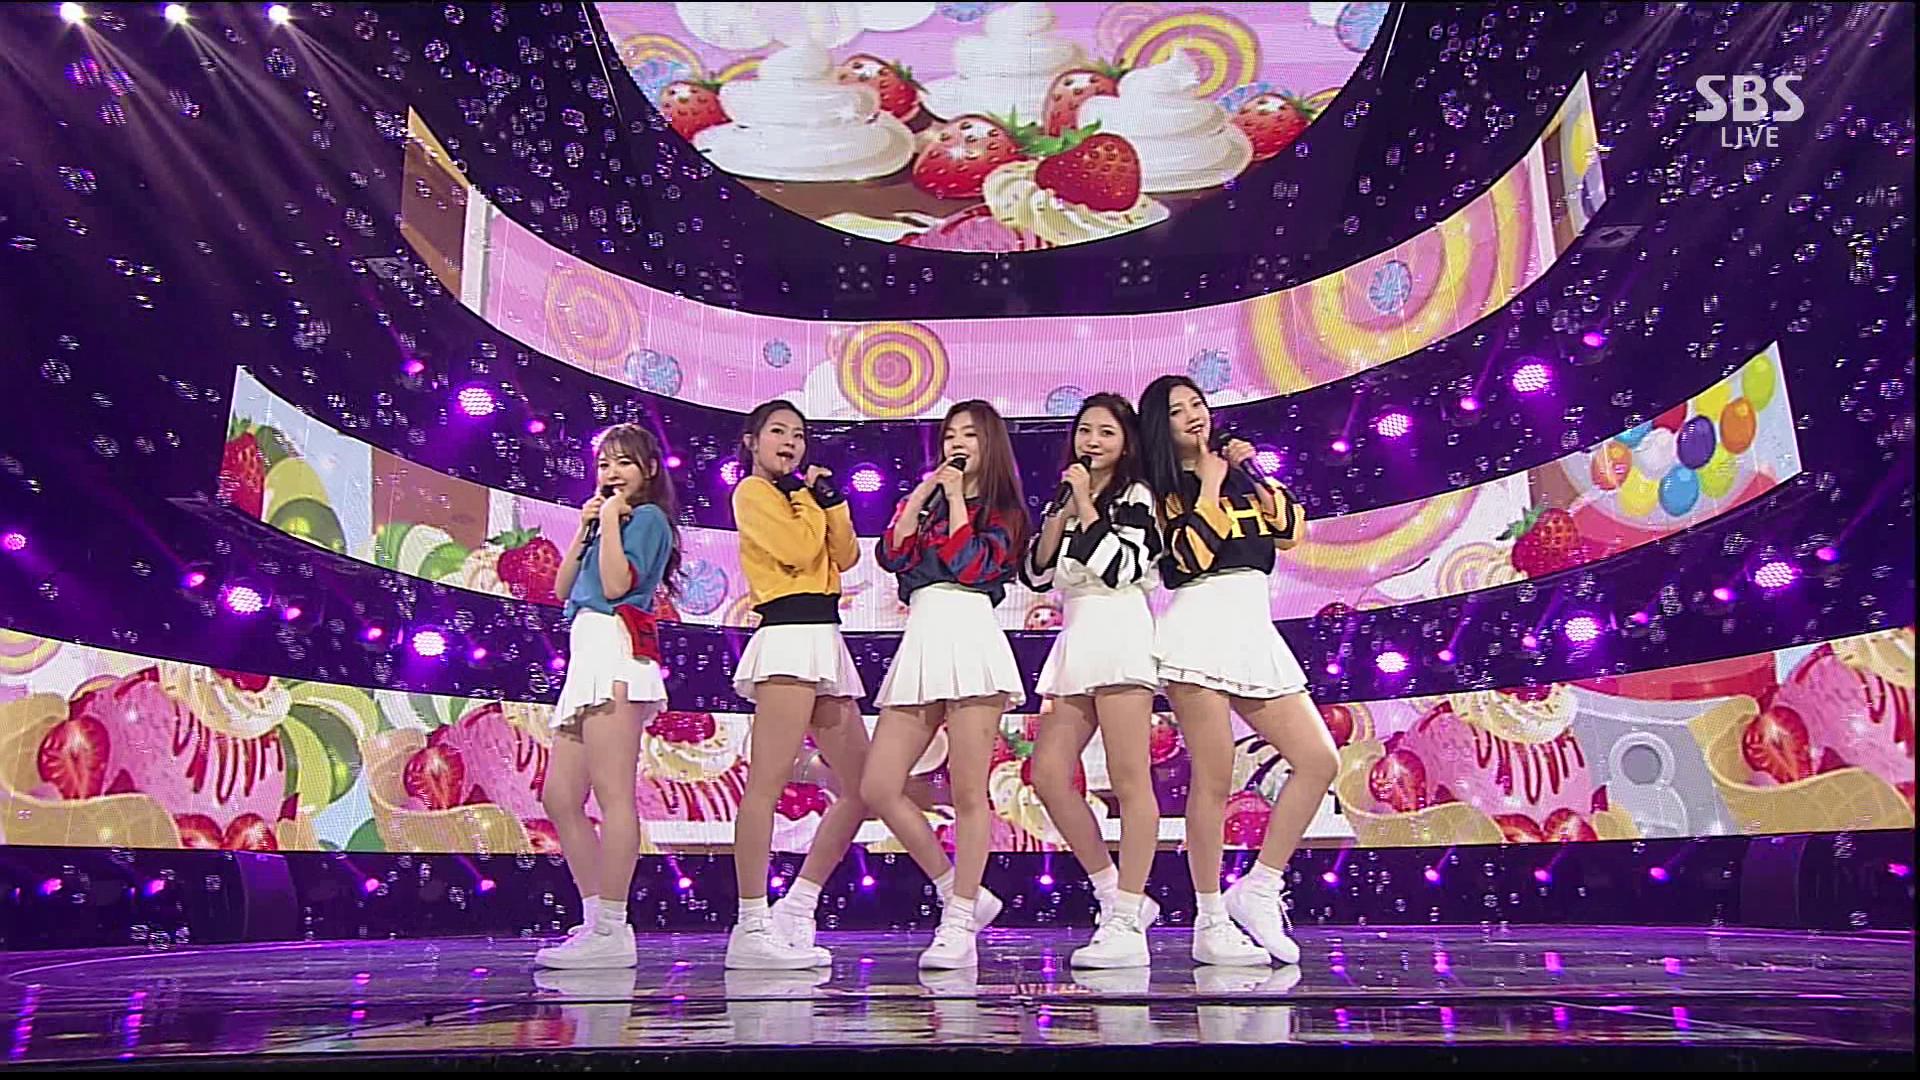 20160817.21.07 Red Velvet - Ice Cream Cake (Inkigayo 2015.05.03 HDTV) (JPOP.ru).ts 1.jpg